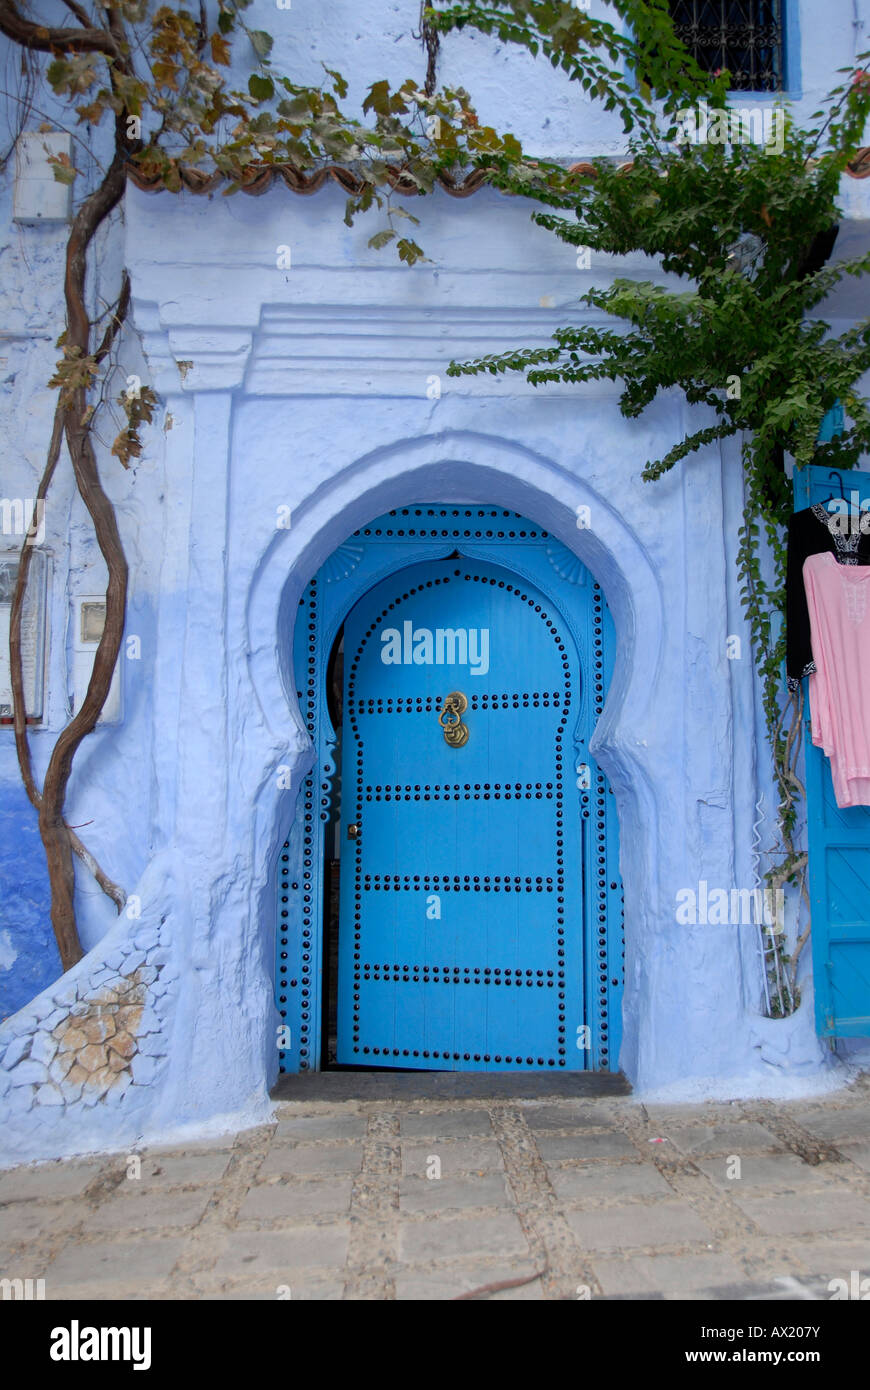 Luminous blue gate medina Chefchaouen Morocco - Stock Image